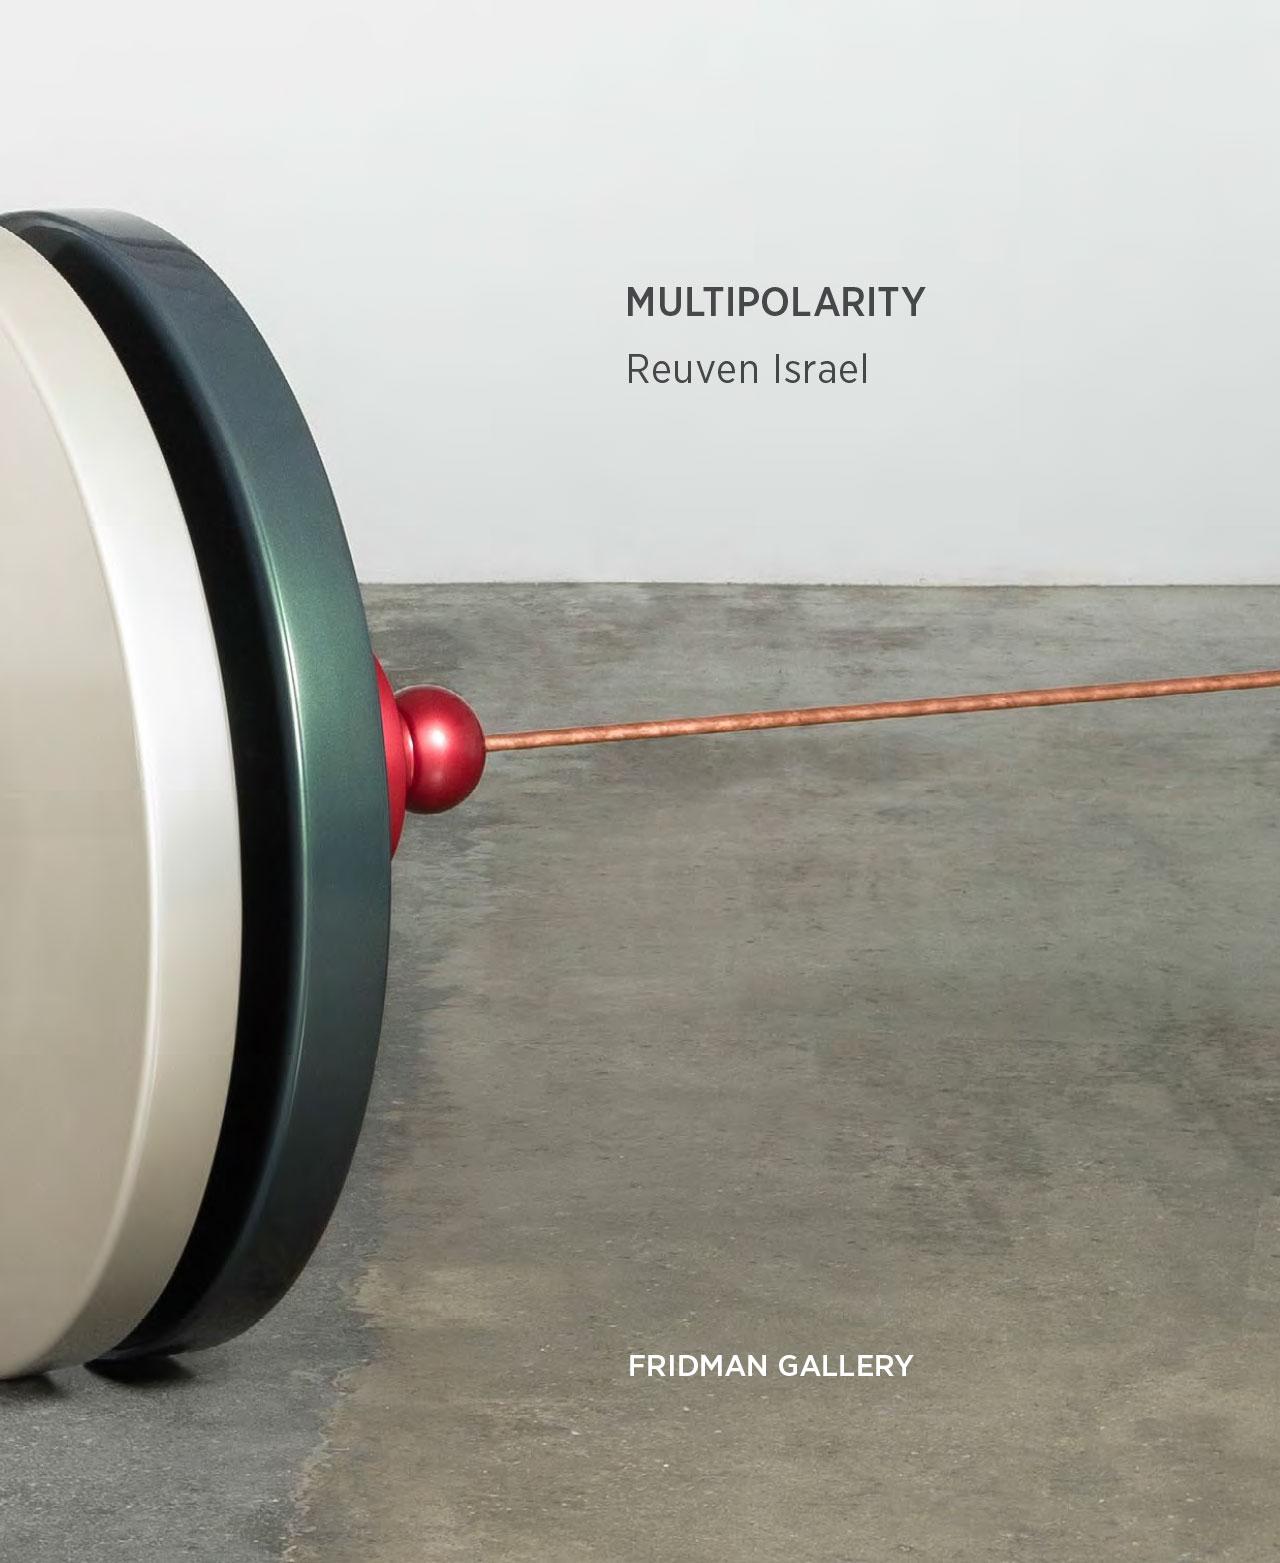 Reuven-Israel-Multipolarity-cover.jpg